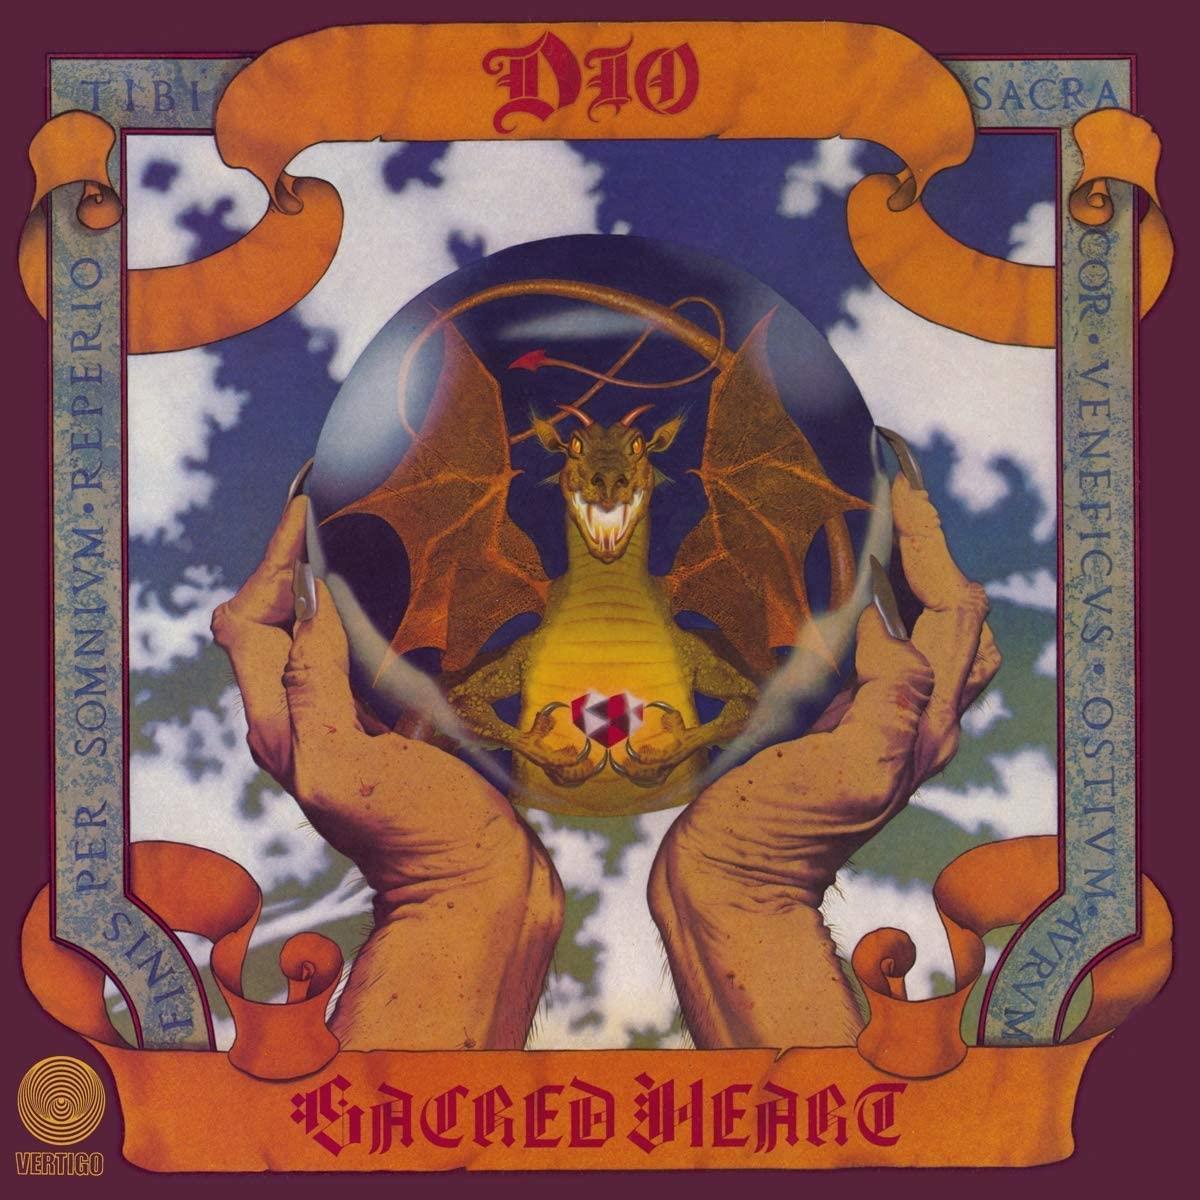 Dio - Sacred Heart [LP]